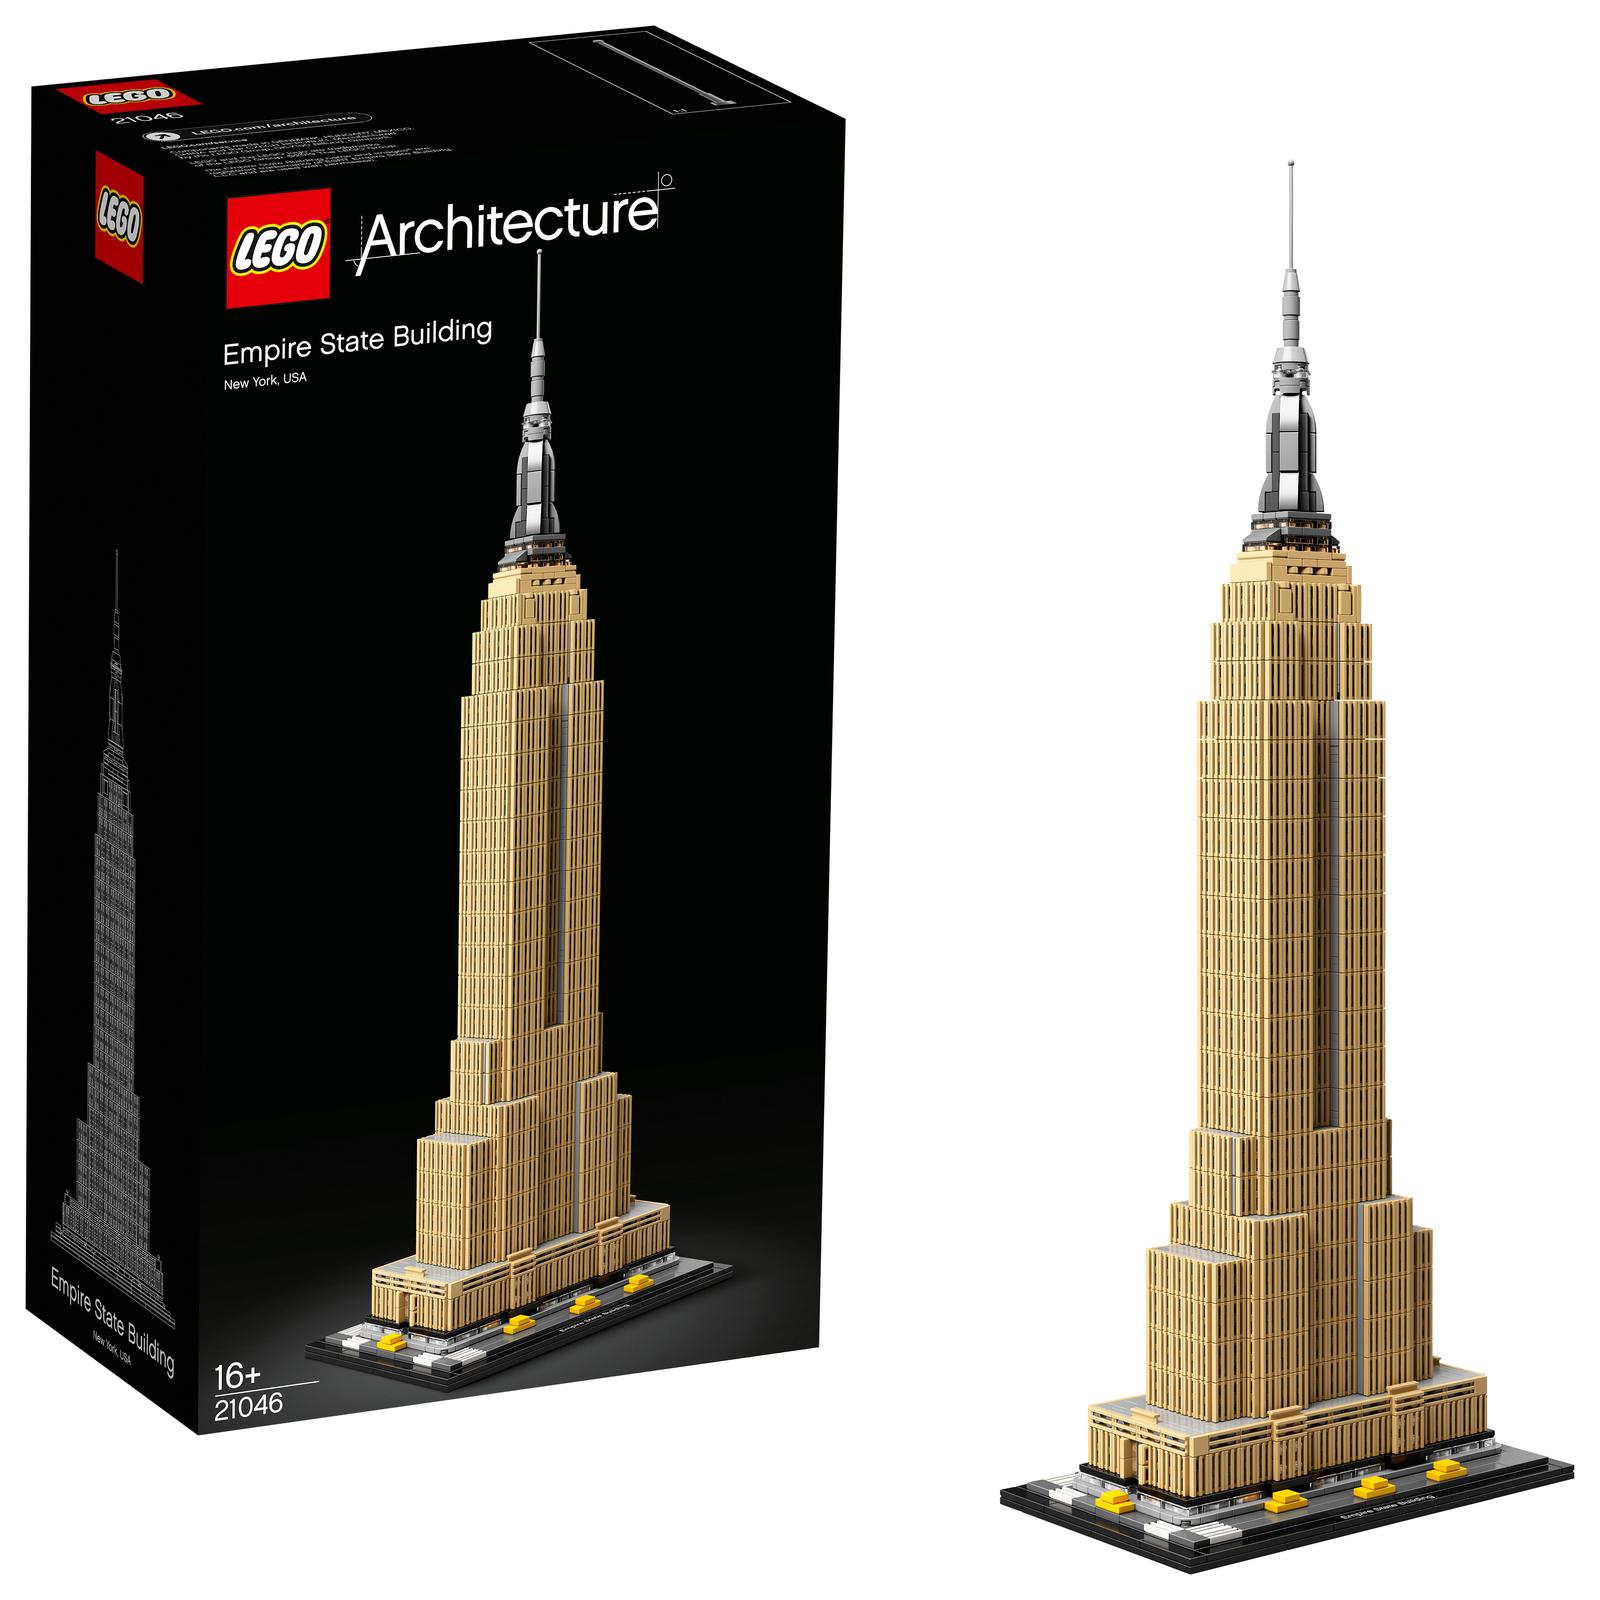 LEGO Architecture: Empire State Building - (21046) image